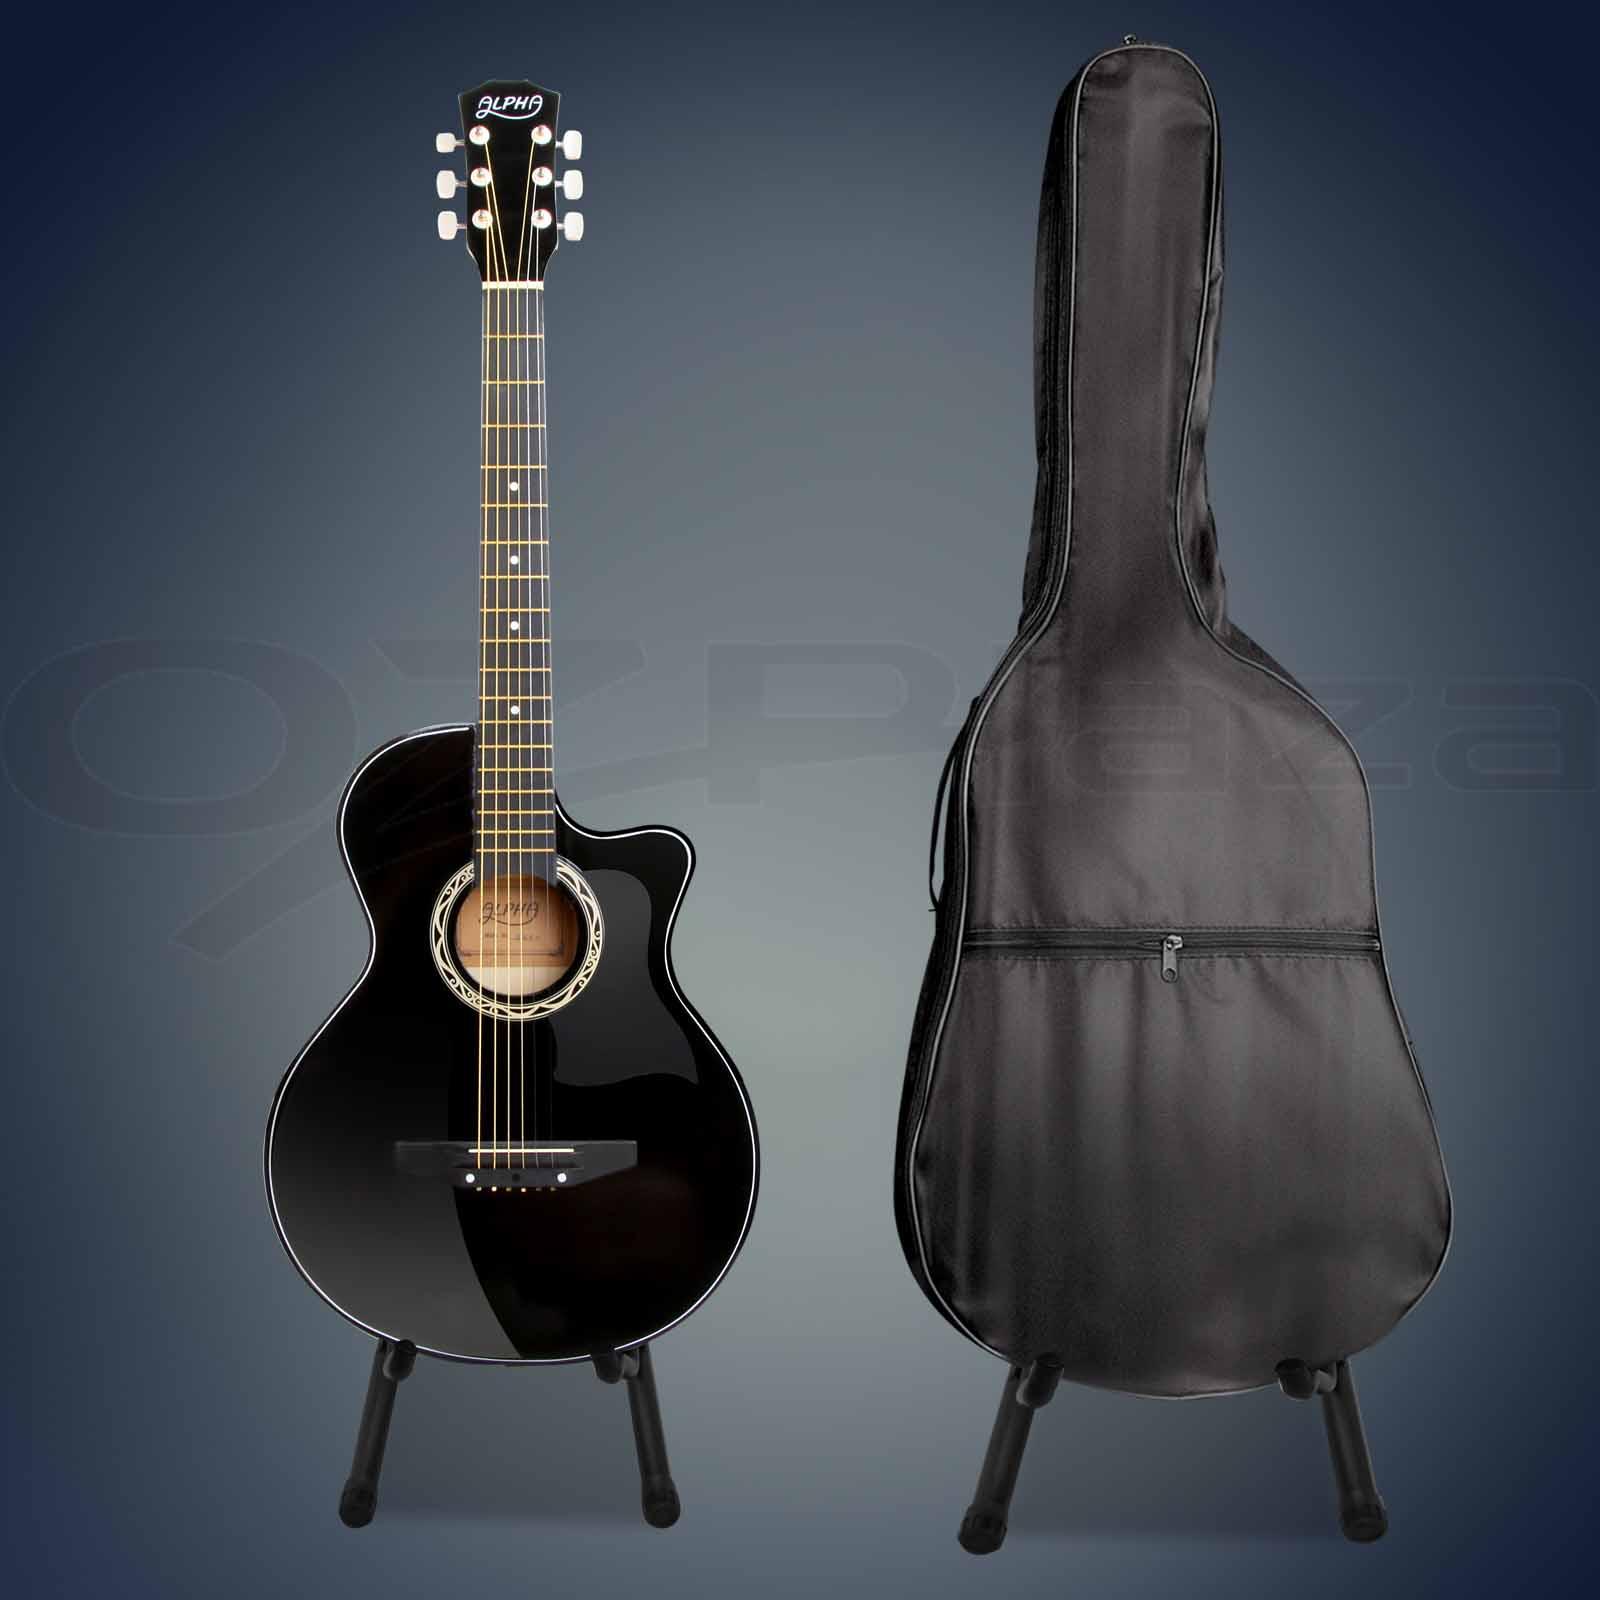 38 inch wooden folk acoustic guitar classical string capo bag stand tuner black ebay. Black Bedroom Furniture Sets. Home Design Ideas